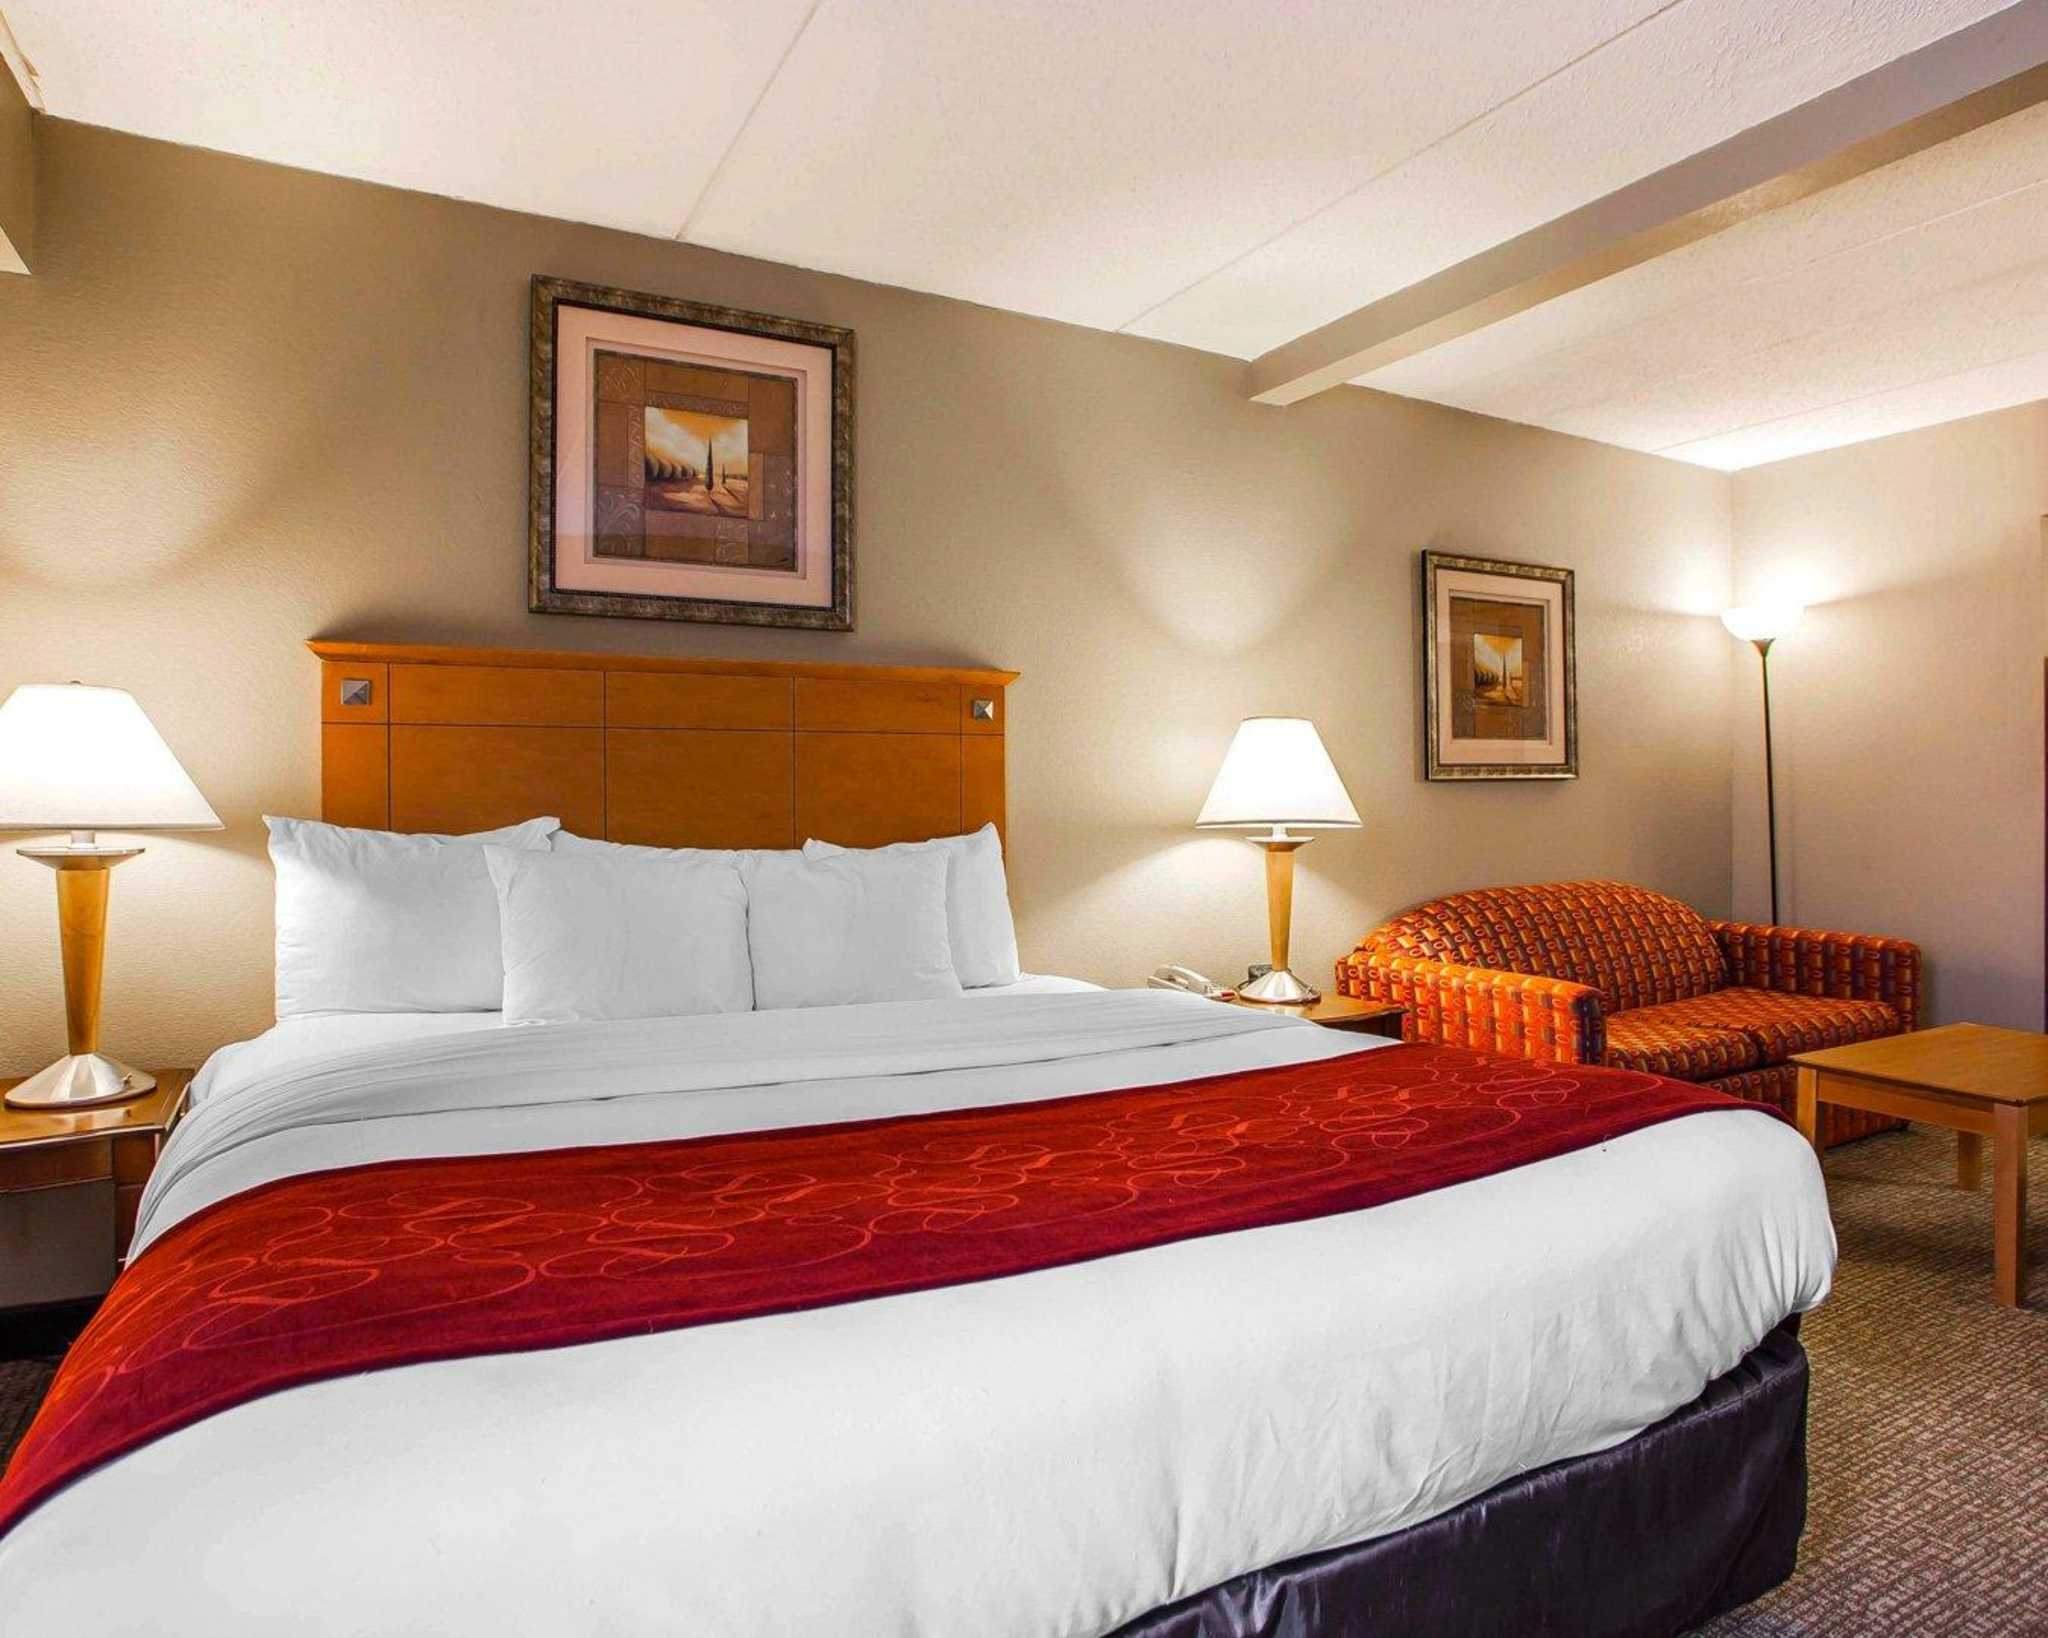 Comfort Suites image 22